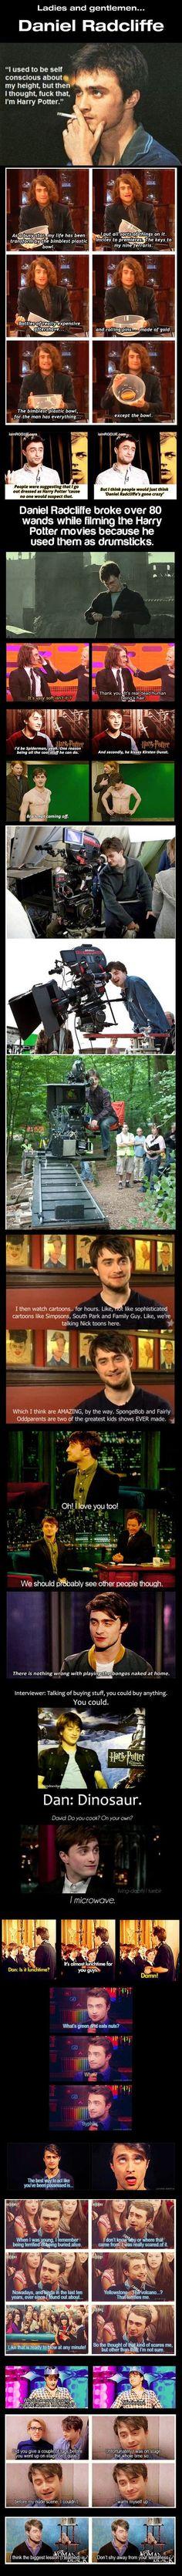 Gotta love him...Daniel Radcliffe on *many* things...⚡️